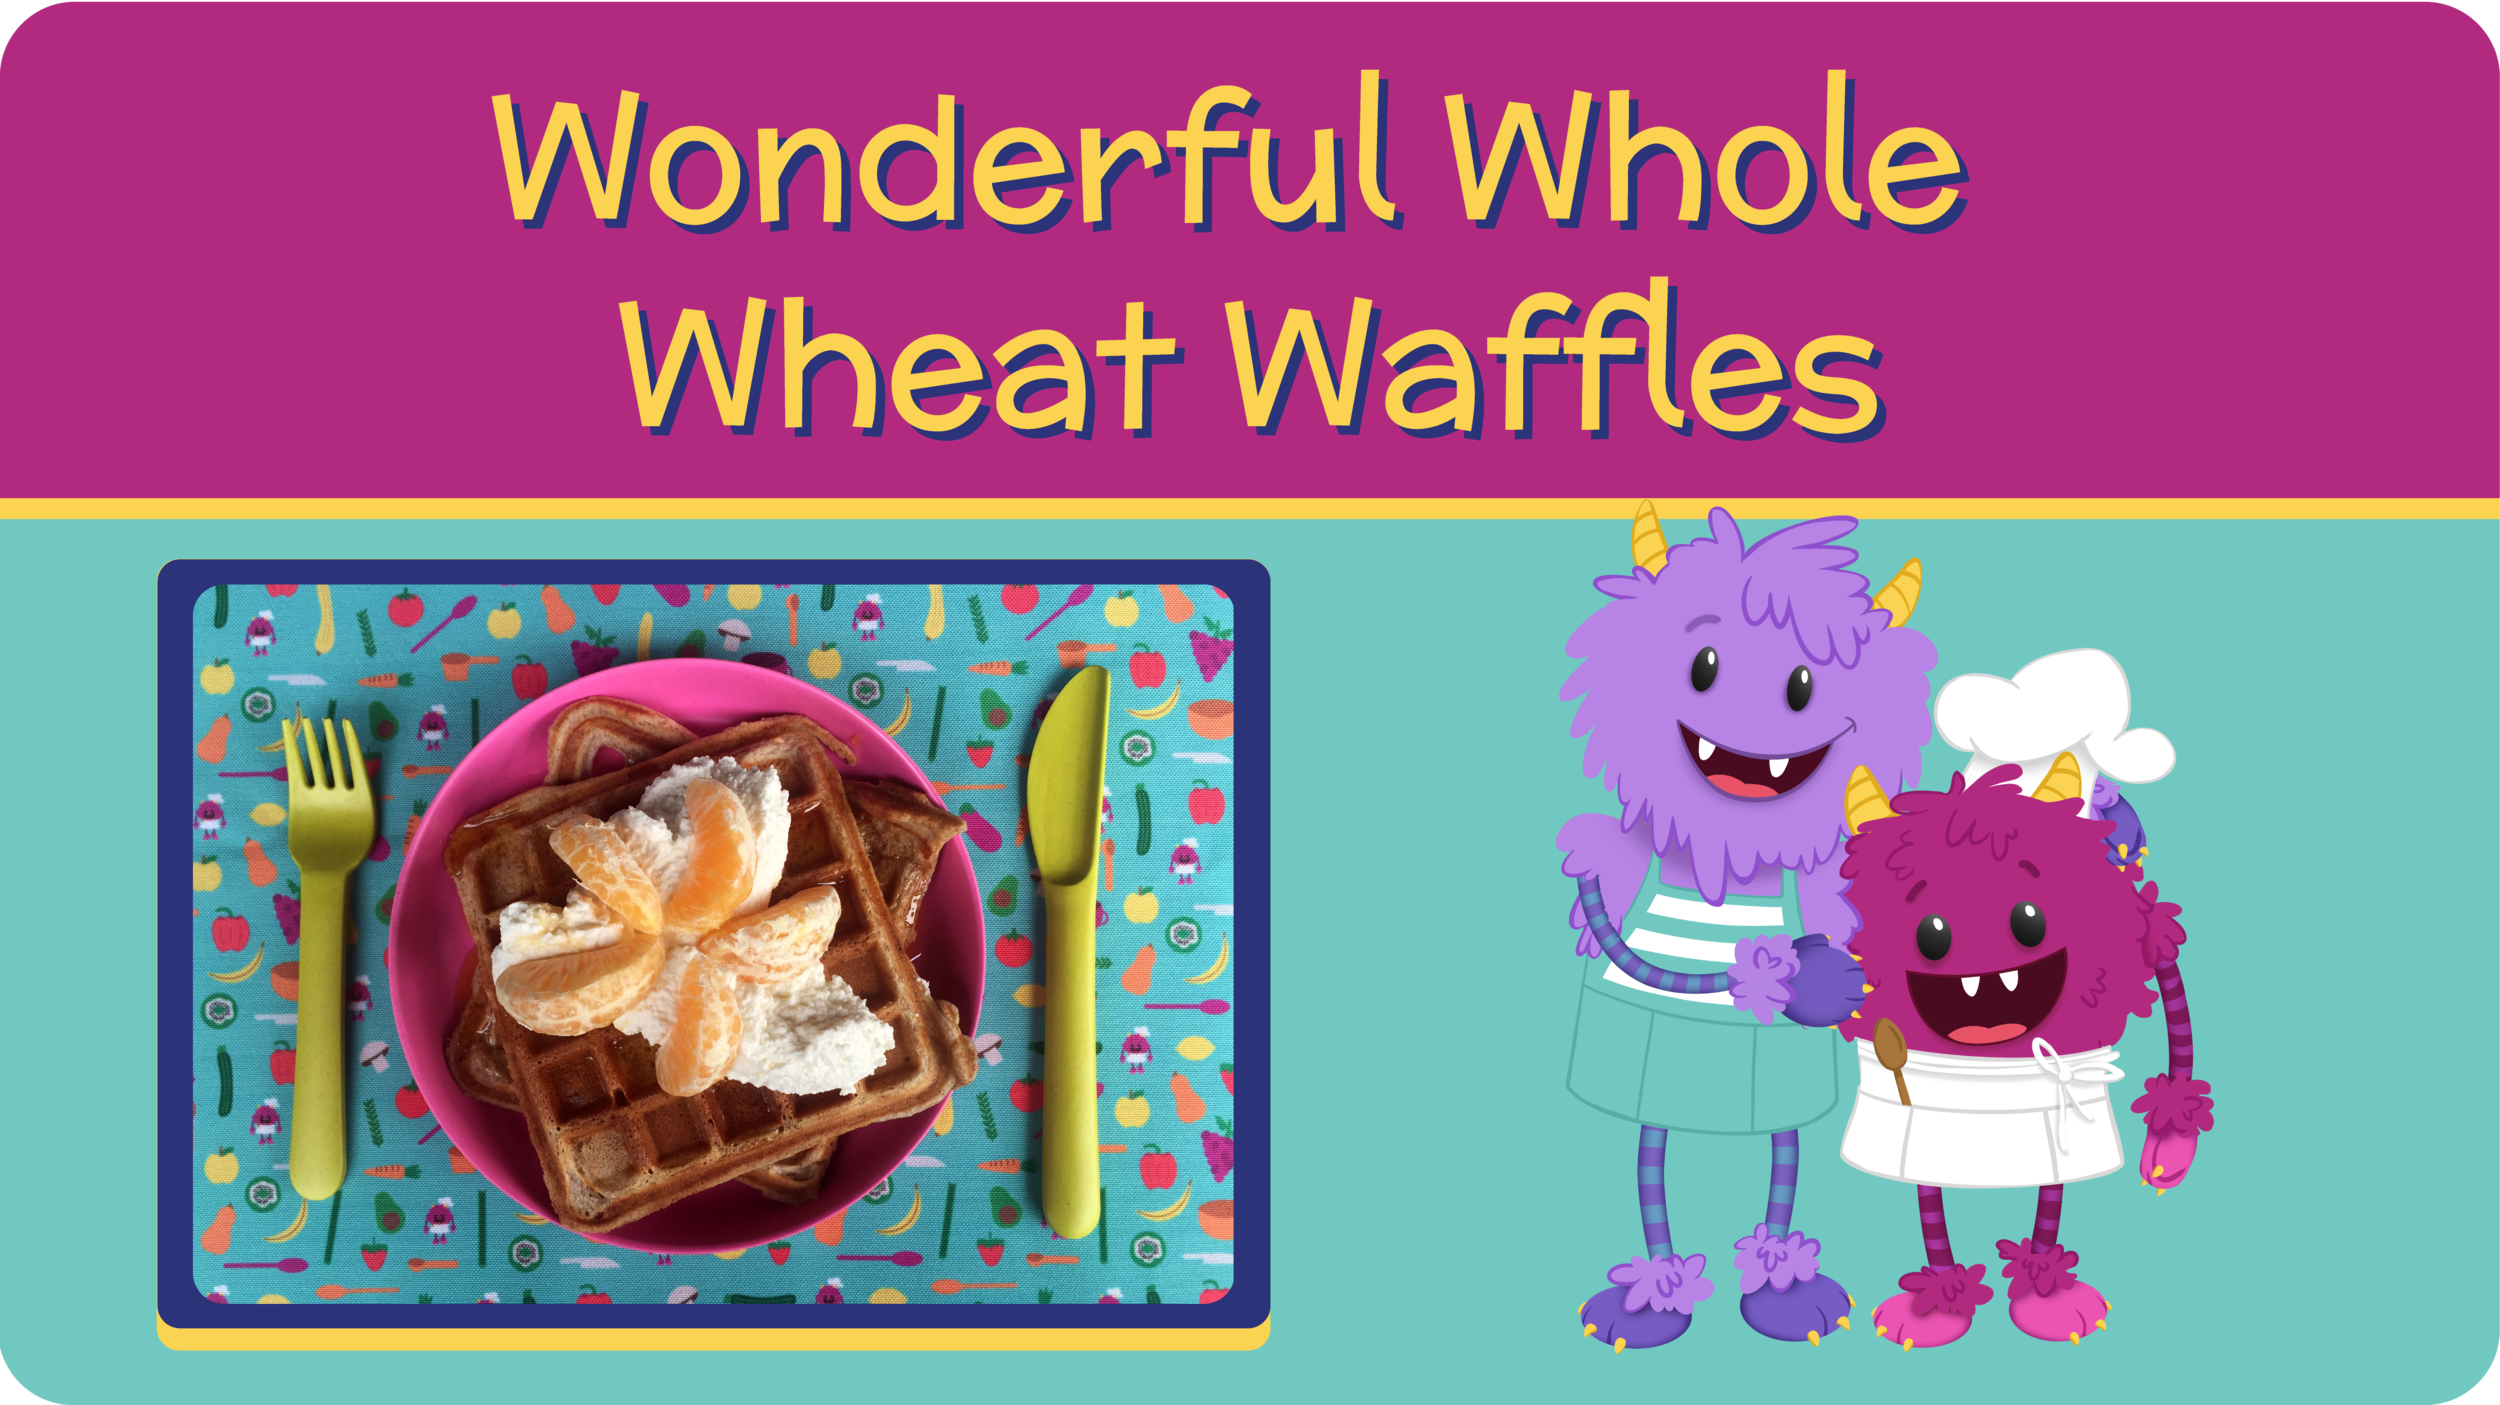 01_WholeWheatWaffle_title-01.png